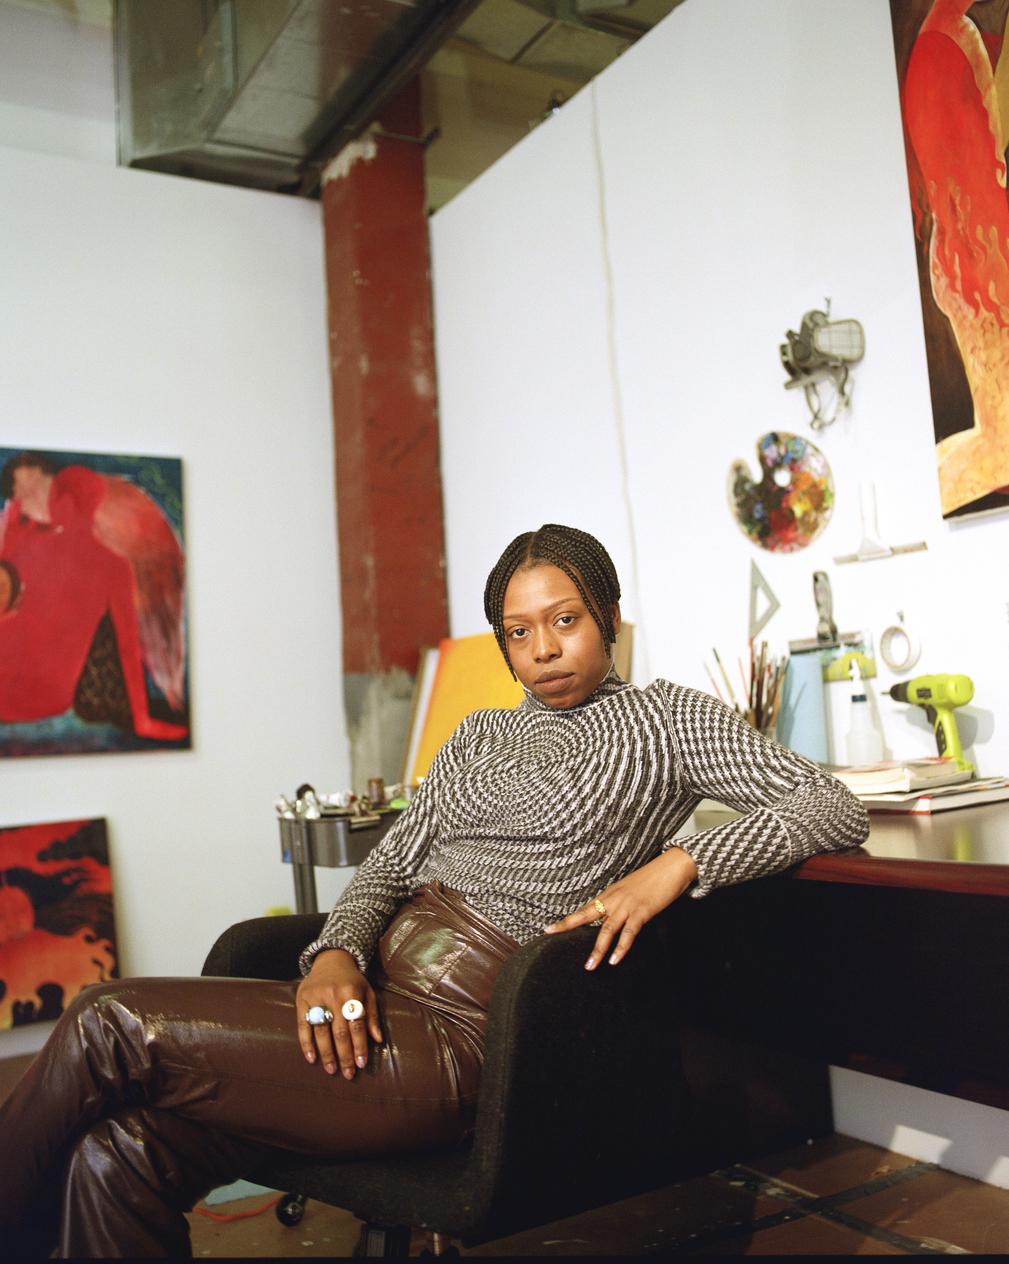 Portrait Artist in residence Naudline Pierre in her studio.